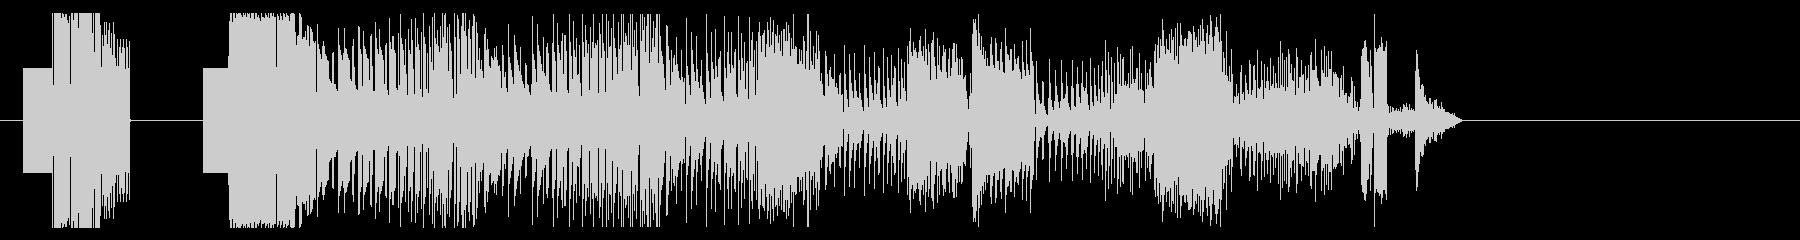 KANT8bit効果音08244の未再生の波形